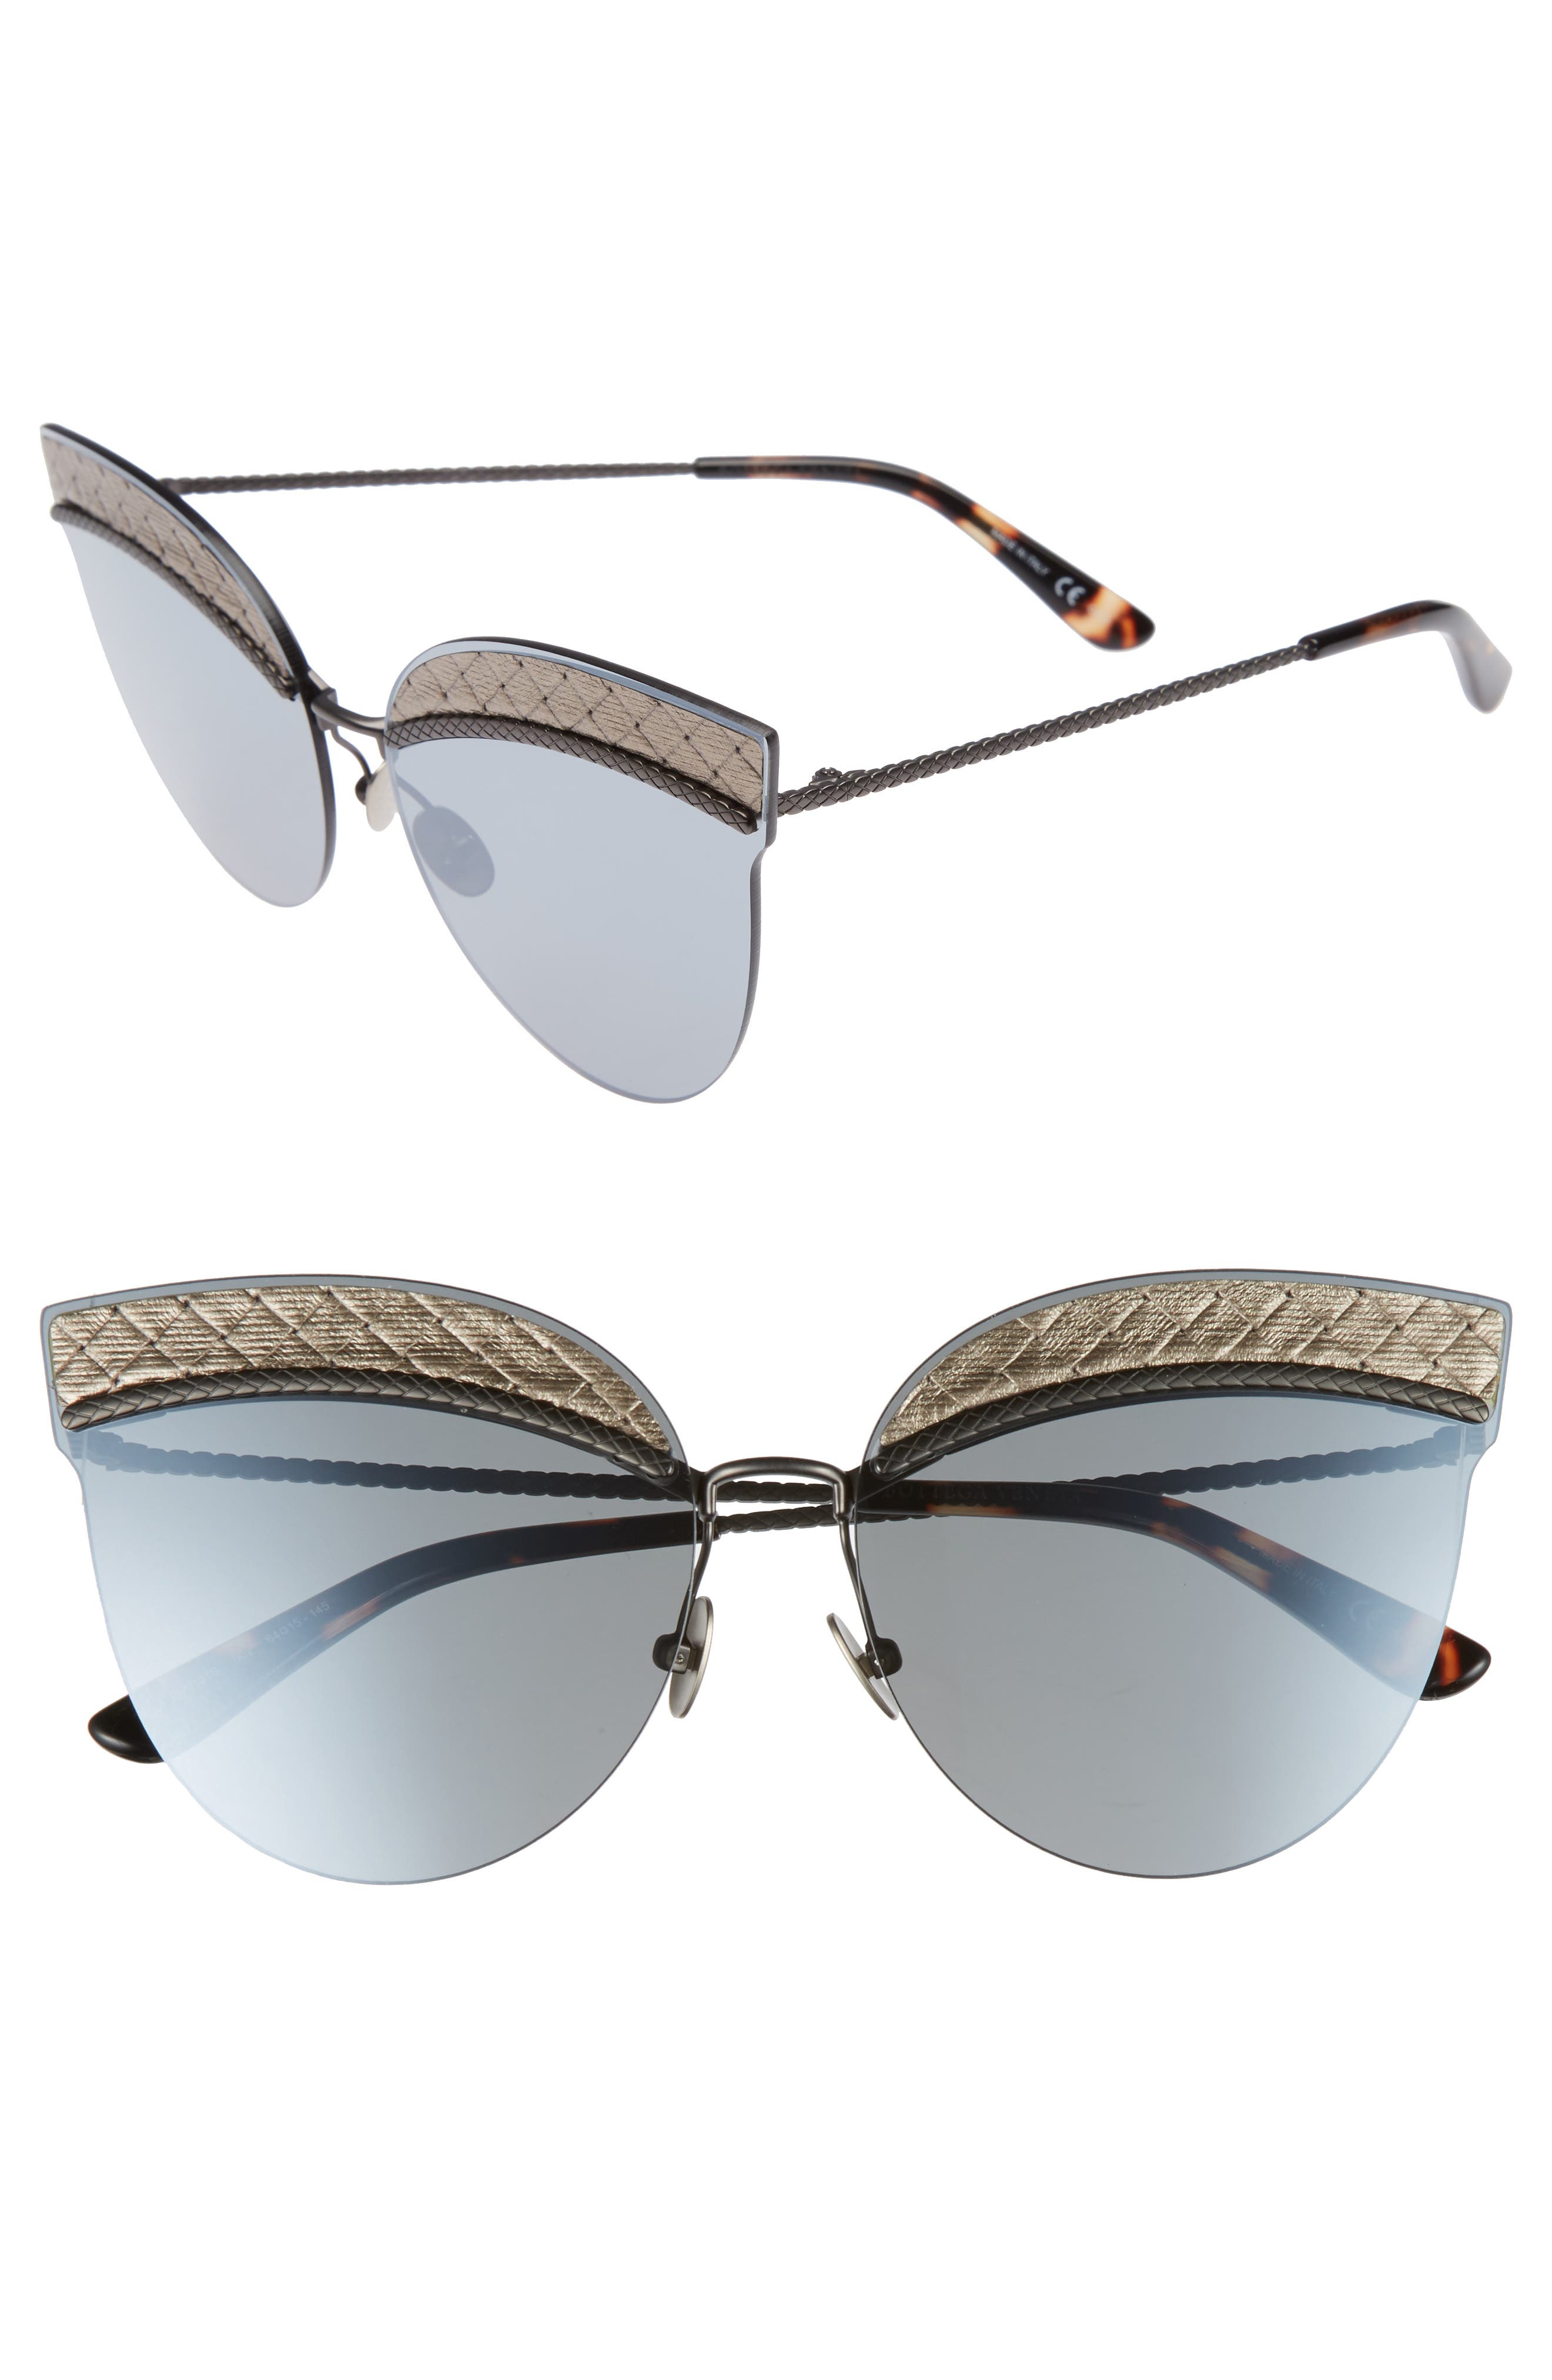 Alternate Image 1 Selected - Bottega Veneta 64mm Semi-Rimless Cat Eye Sunglasses